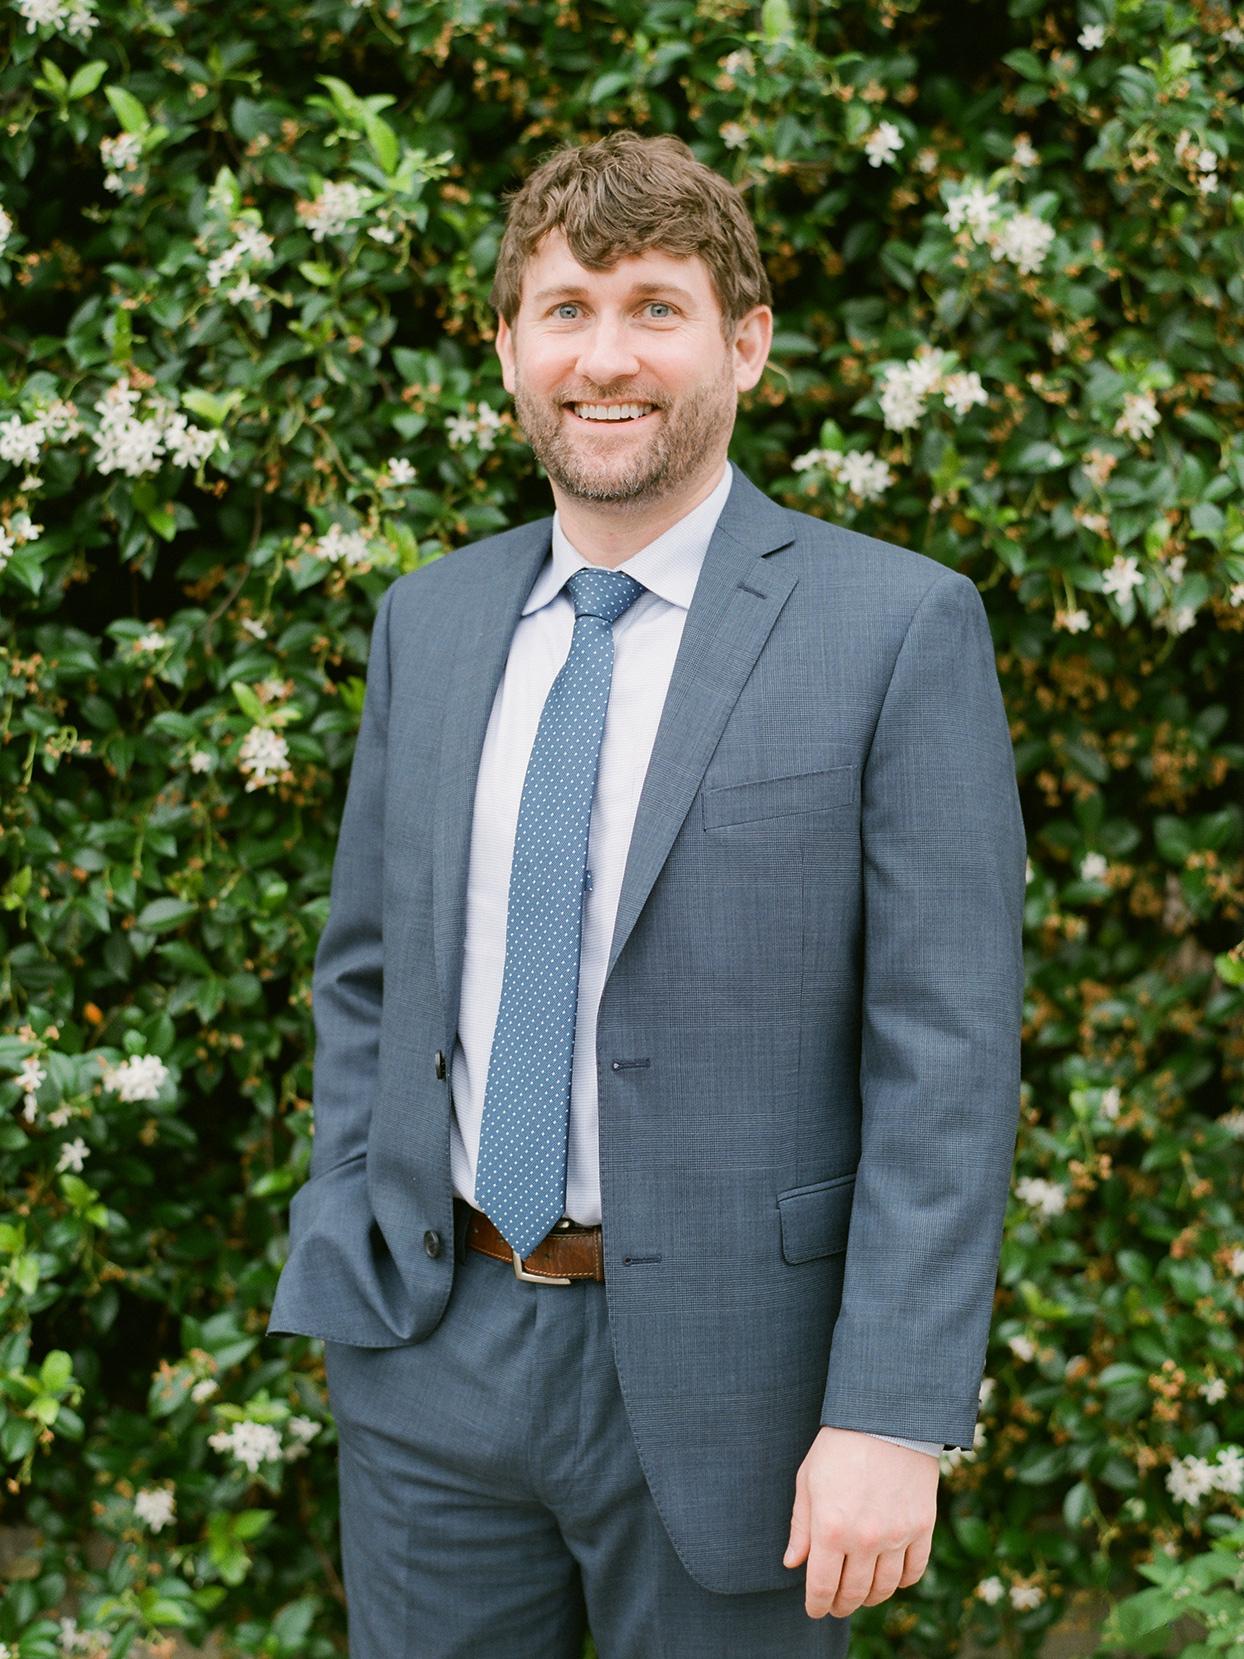 Groom wearing navy blue textured suit and tie